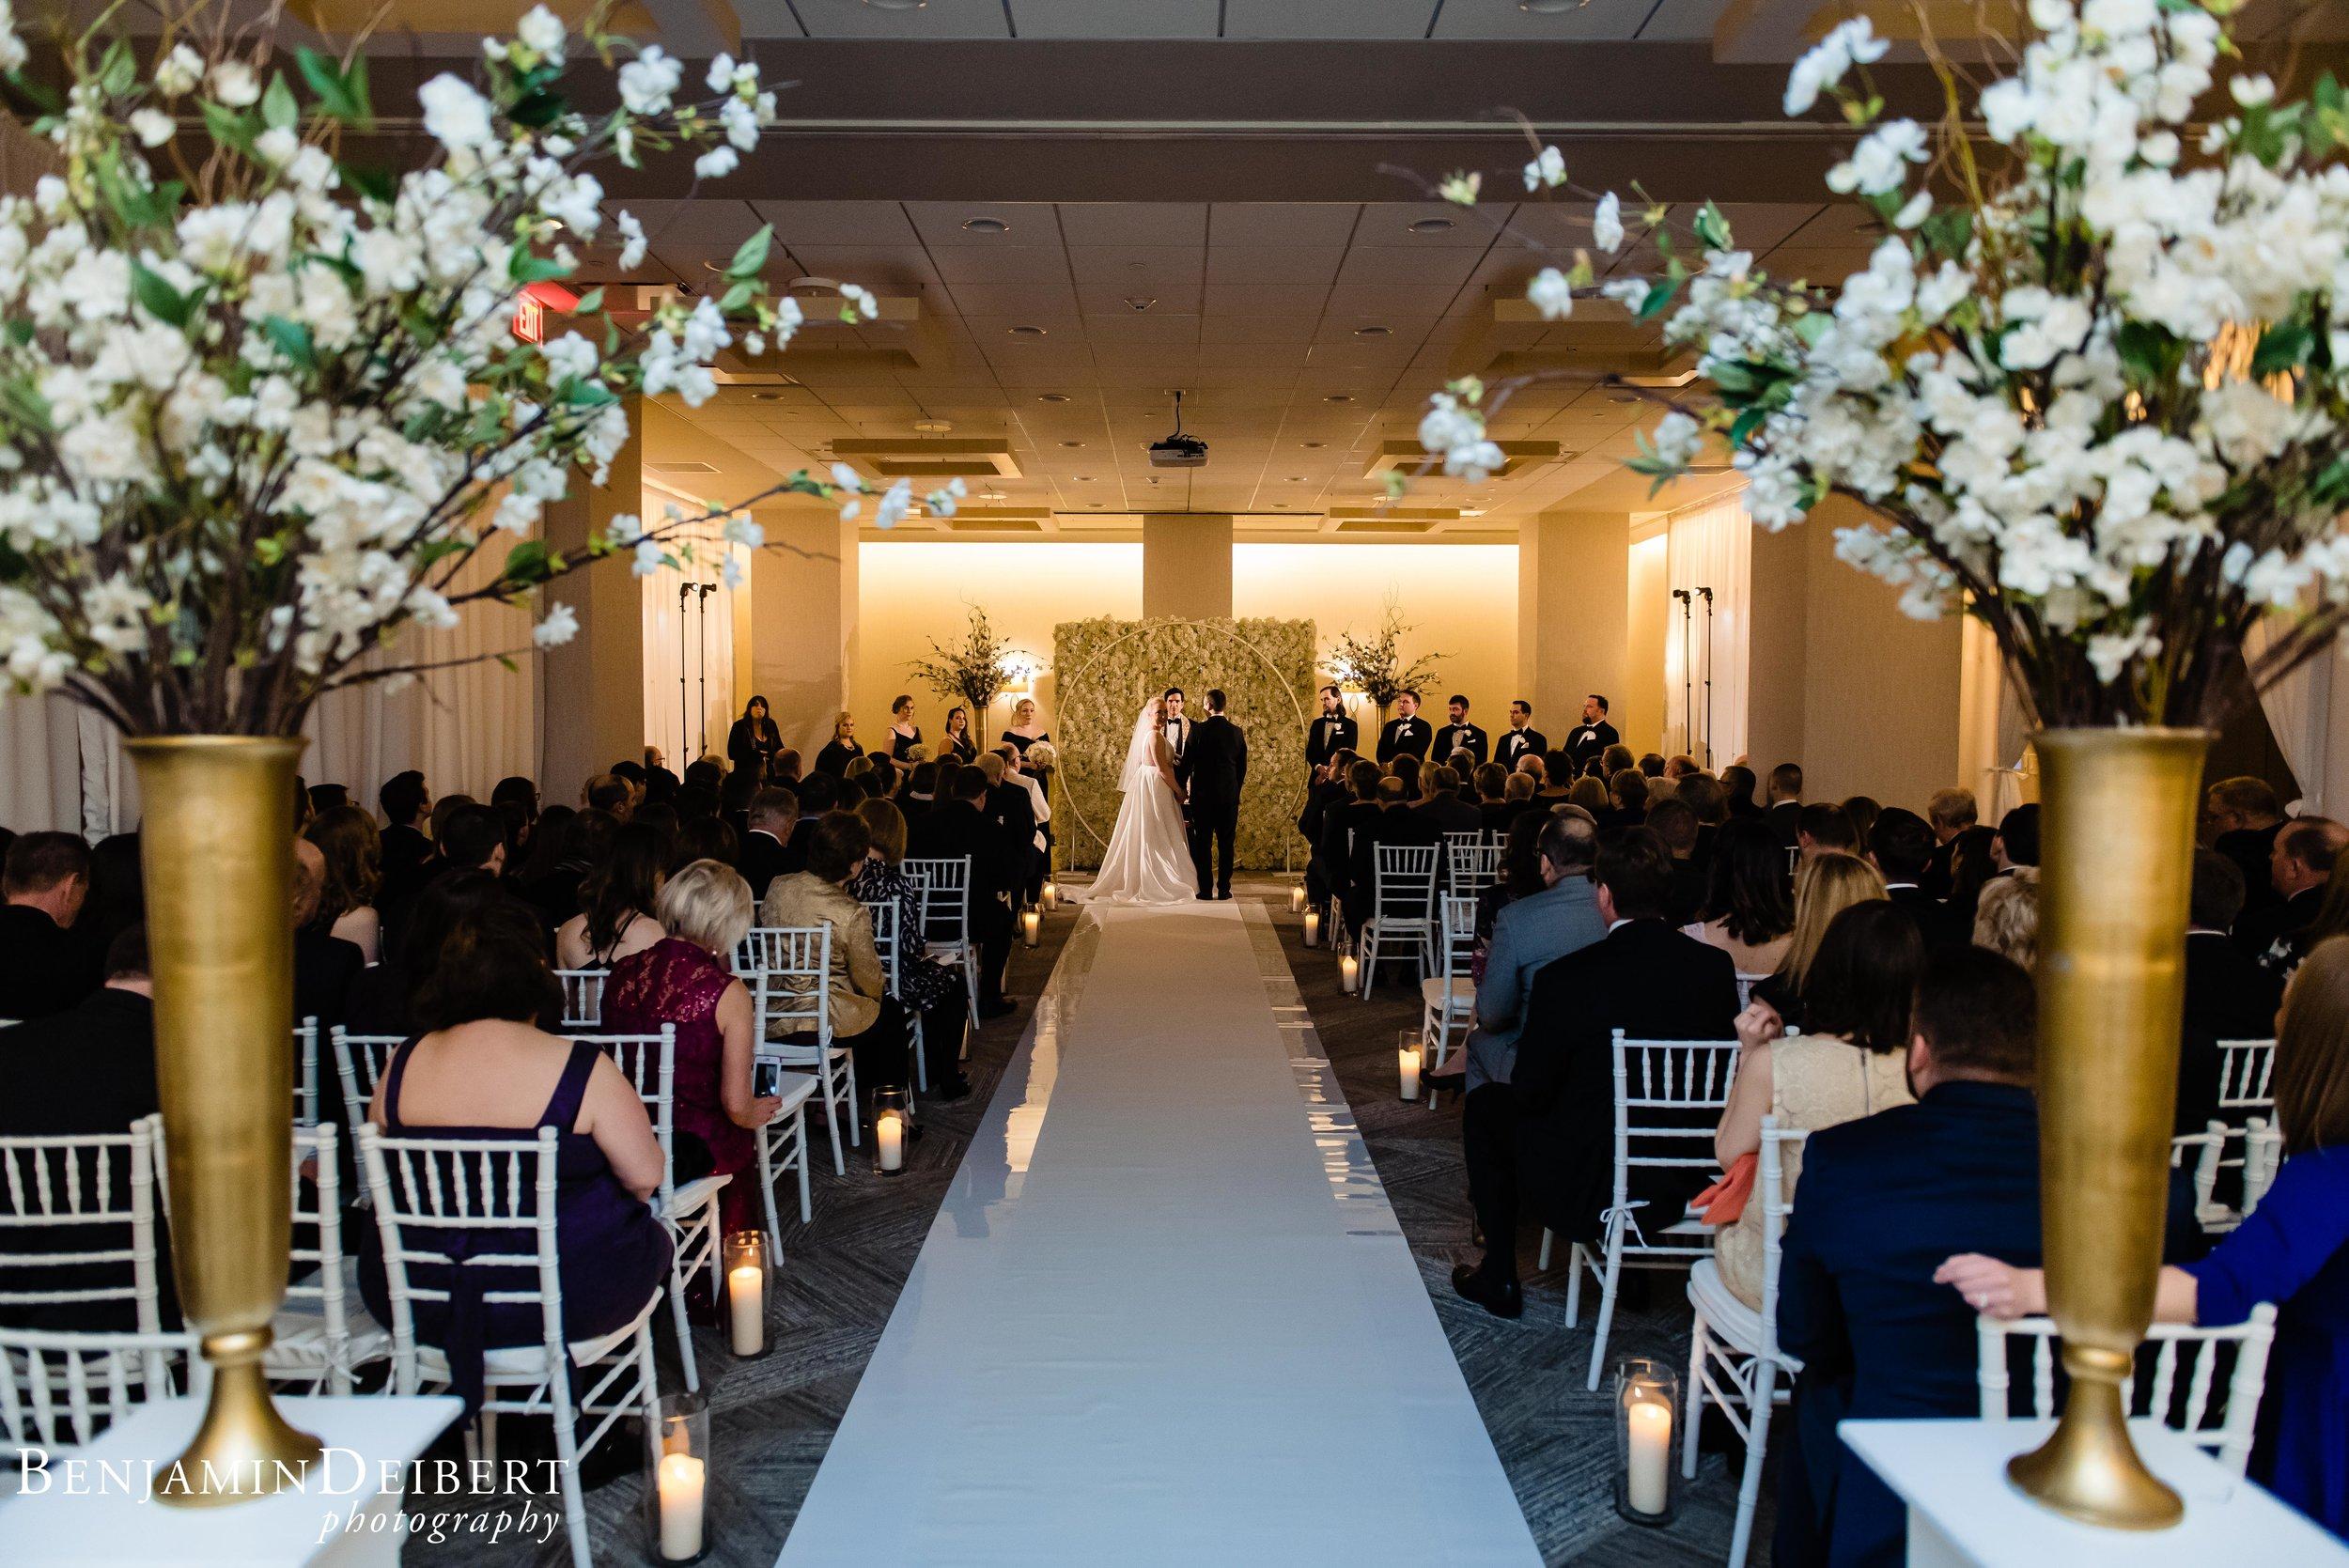 PatriceandAdam_TheLucy__Cescaphe_Wedding-34.jpg